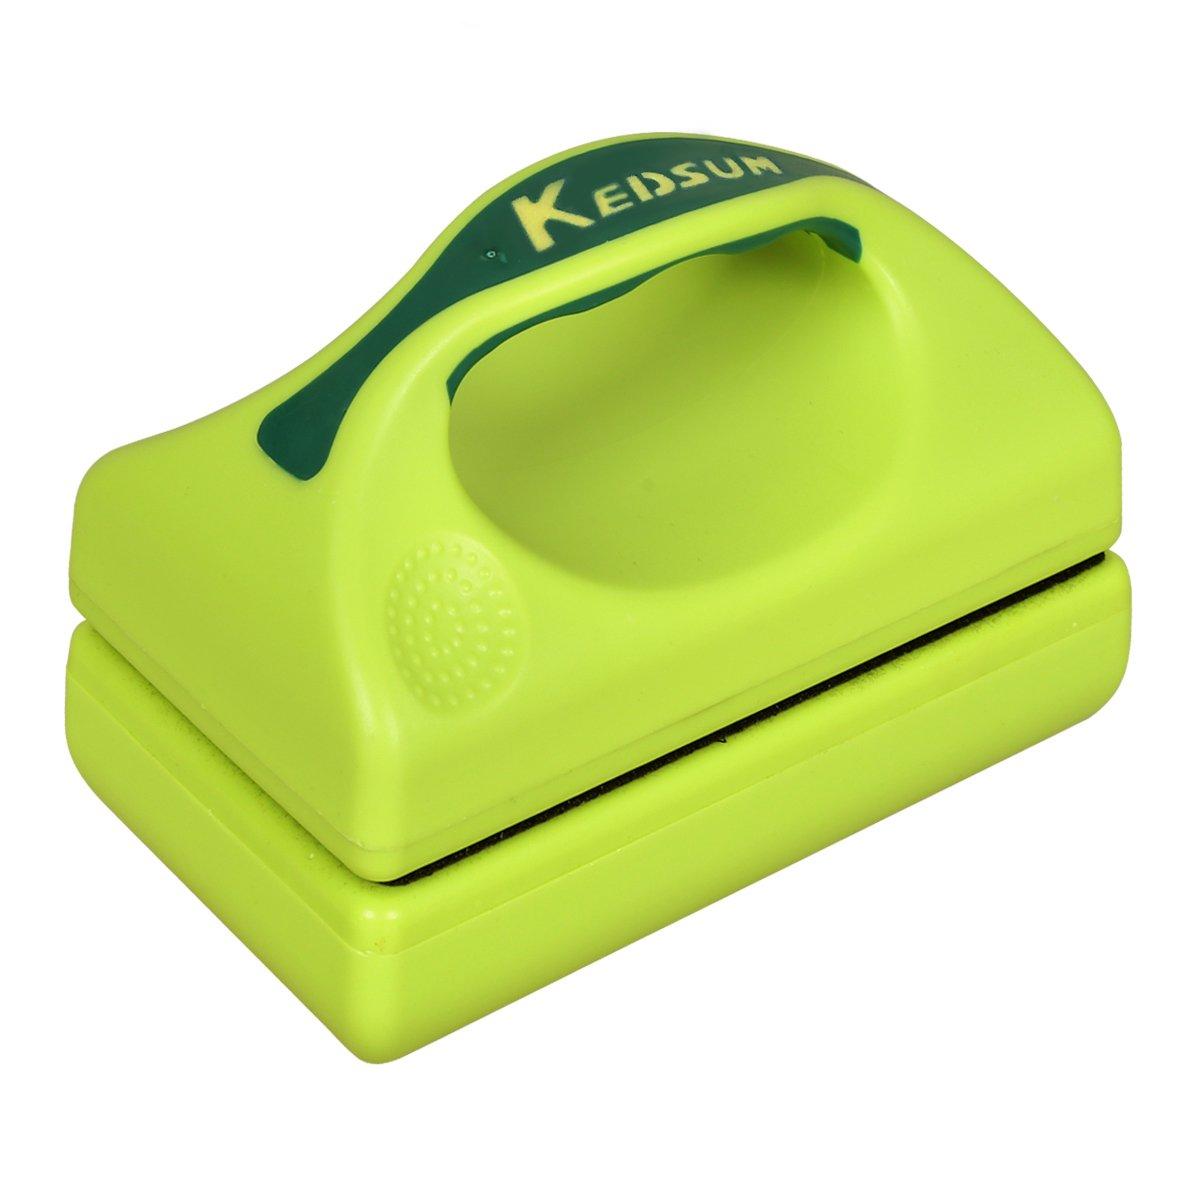 KEDSUM Magnetic cleaner